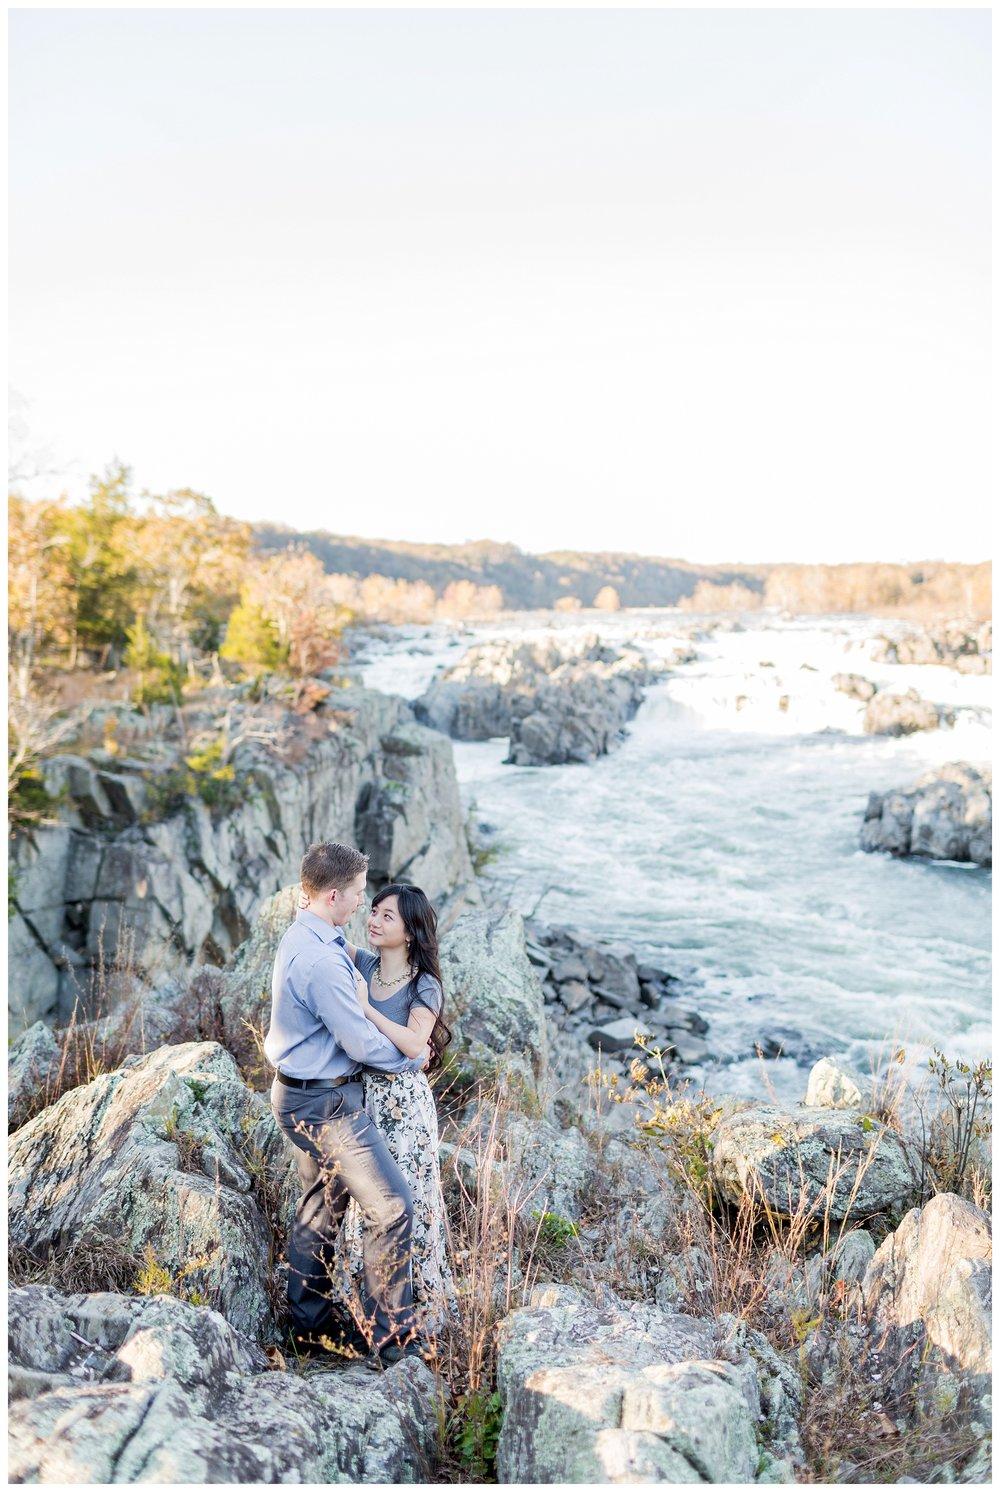 Great+Falls+Engagement.jpg